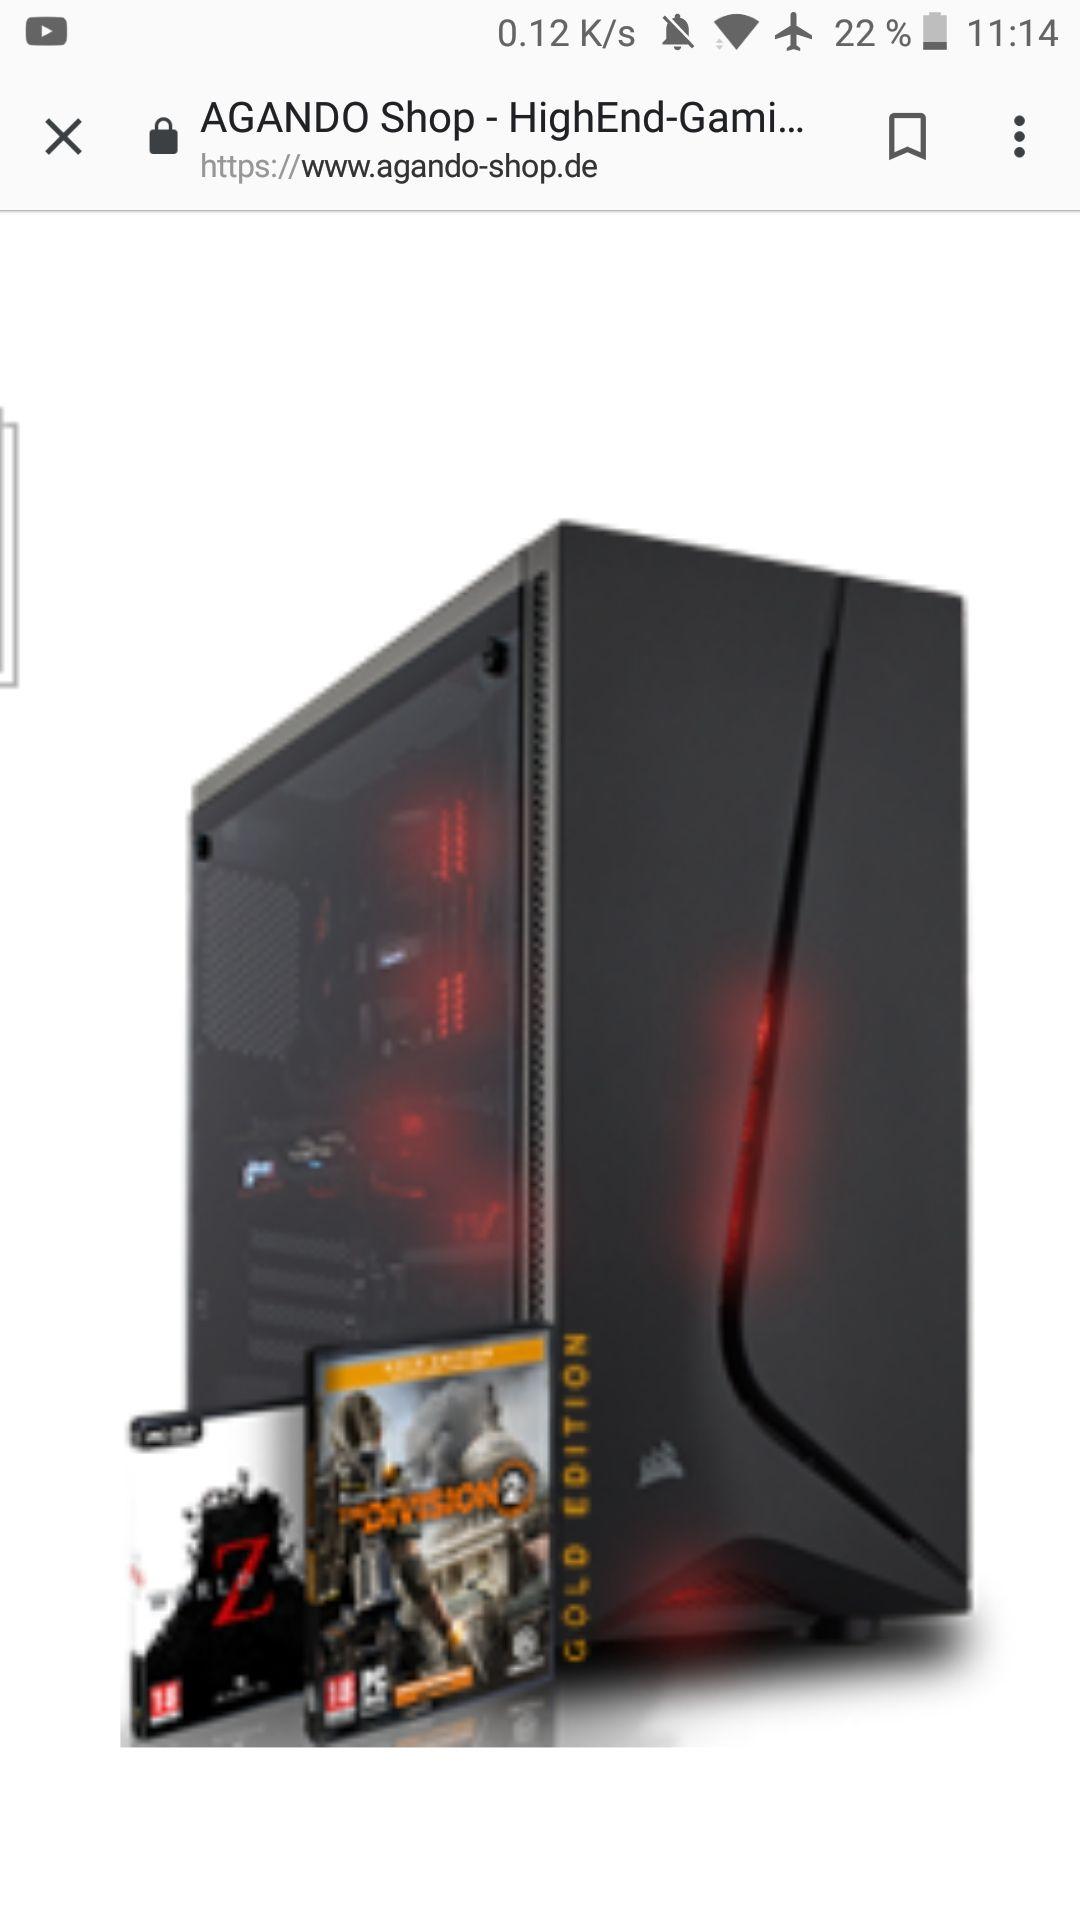 Gaming PC, RYZEN 5 2600, RX 580 8GB, 16 GB DDR4 RAM, 120GB SSD , 1TB HDD, 450W Corsair Netzteil Win10 INCL. Division 2 gold ed.&World War Z